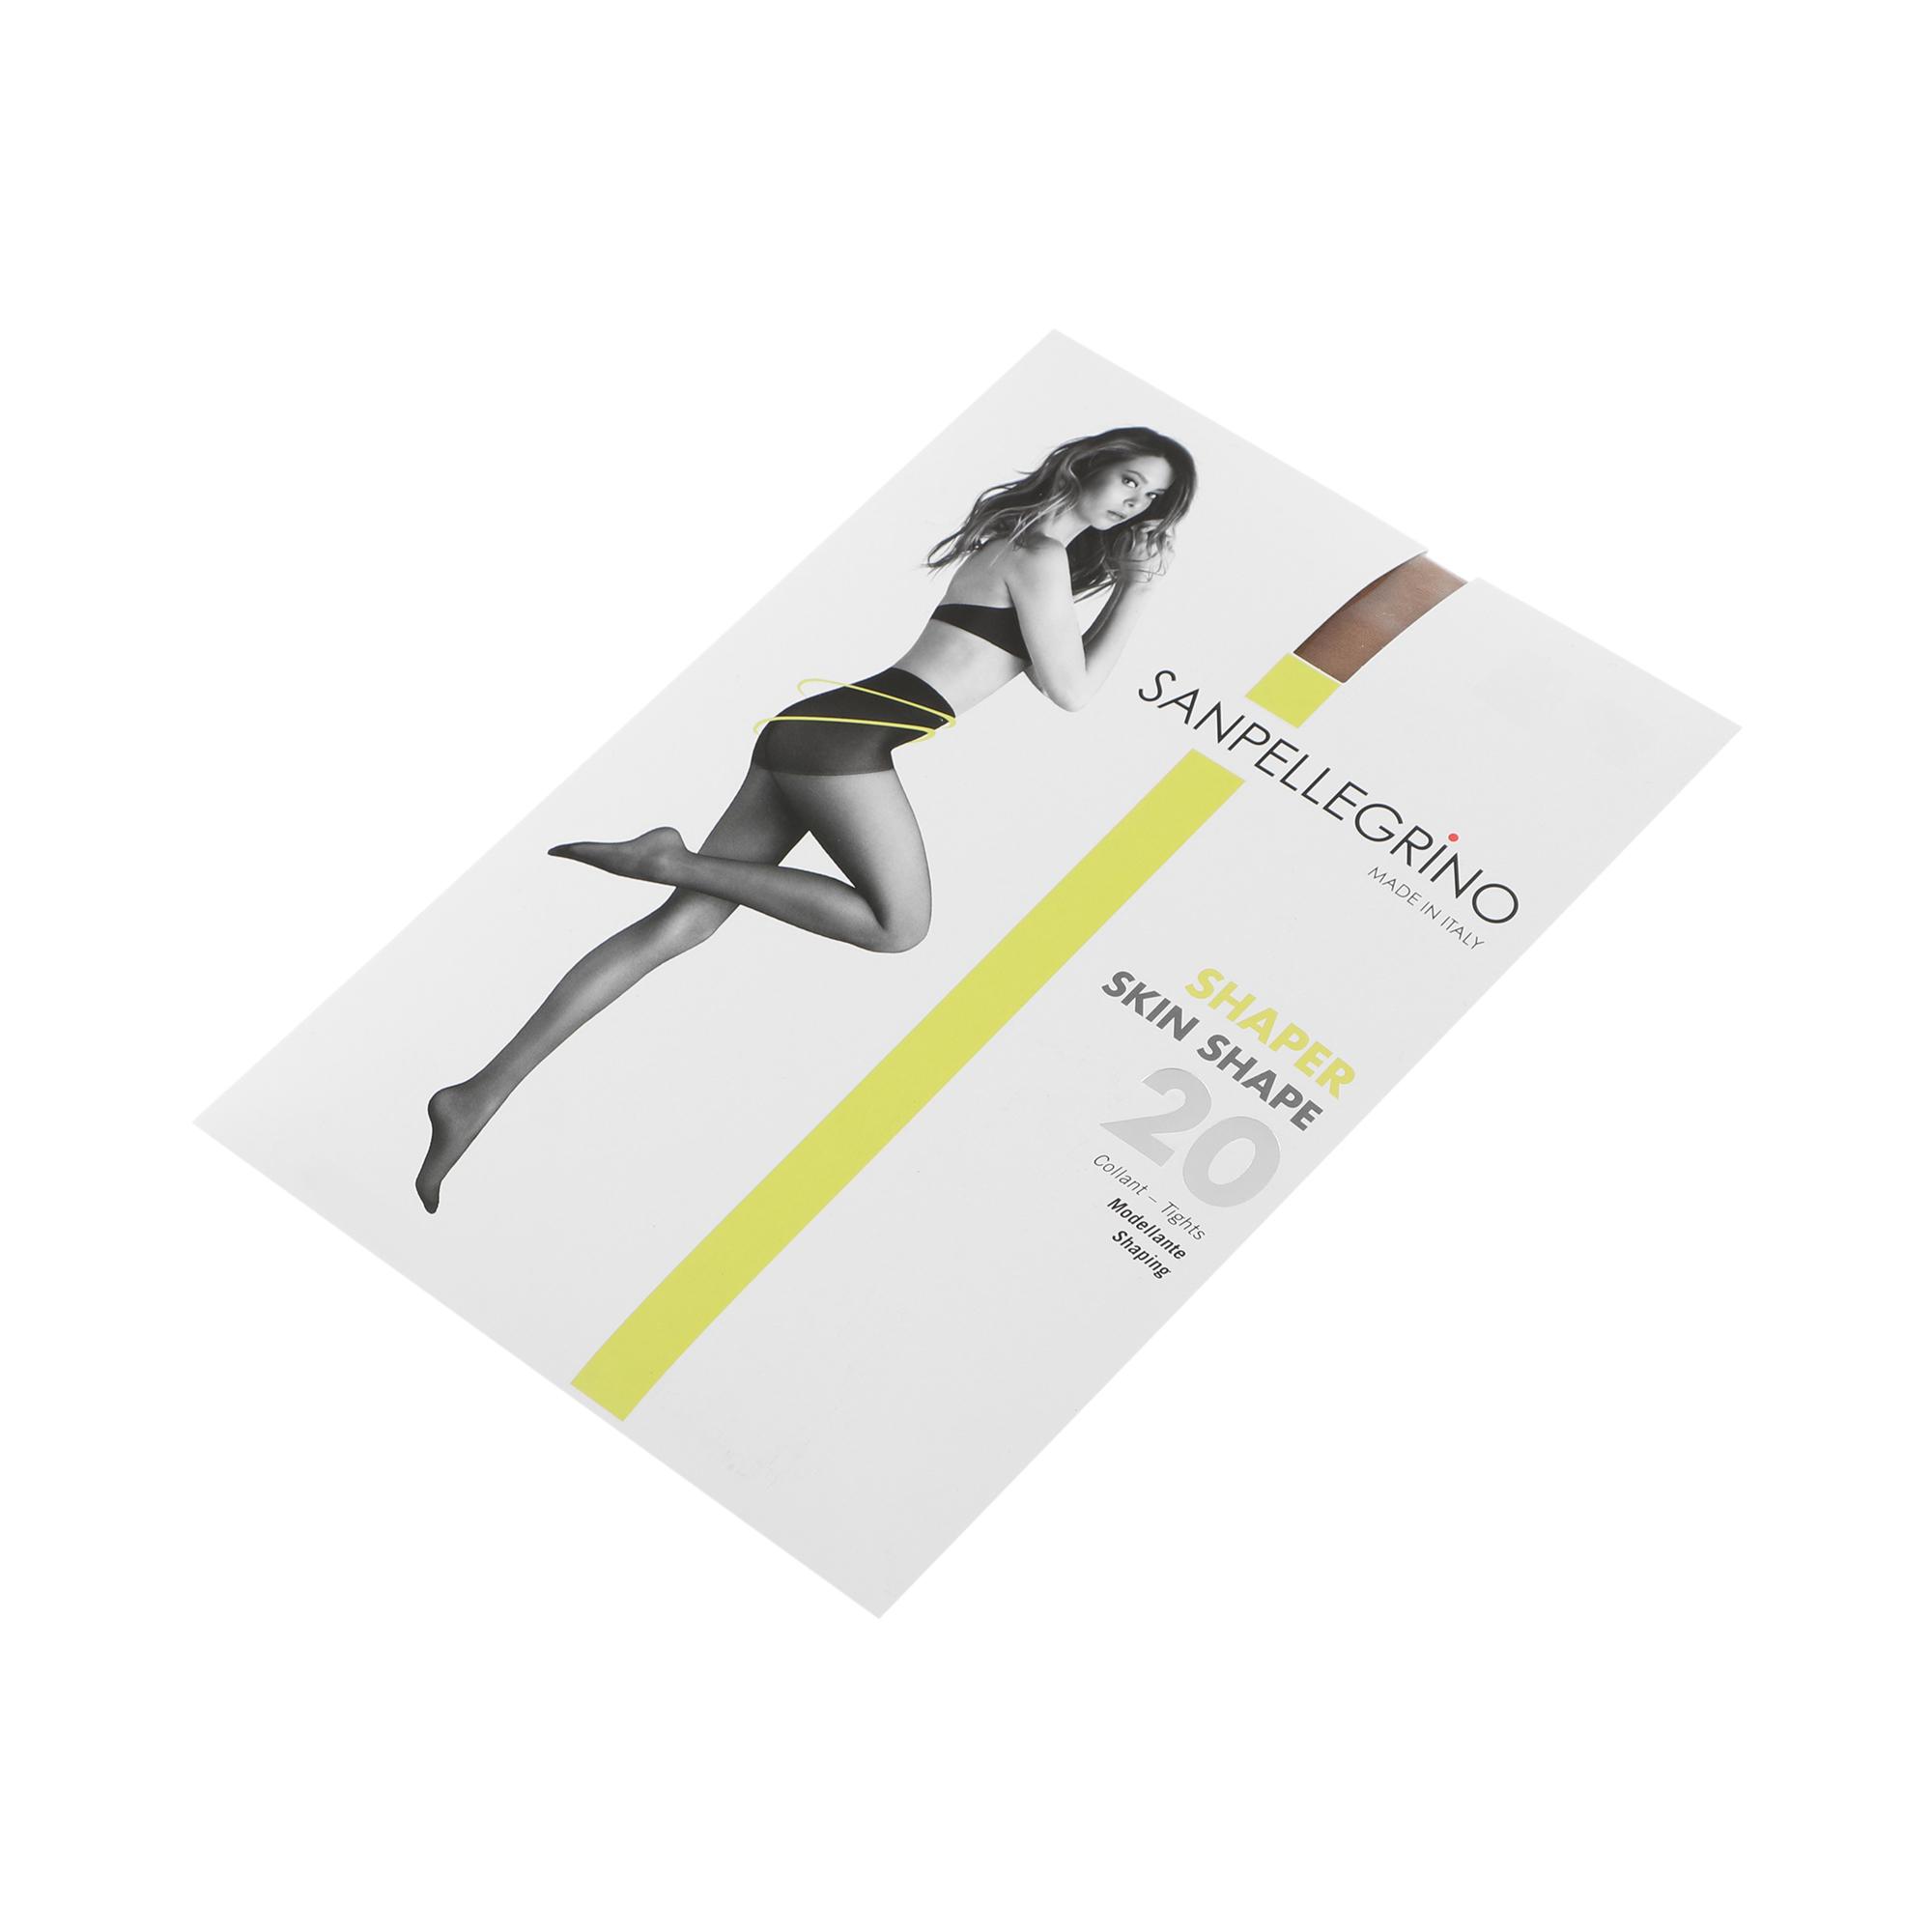 Колготки Sanpellegrino Skin Shape 20 Nudo XL колготки sanpellegrino comodo curvy 20 nudo xl